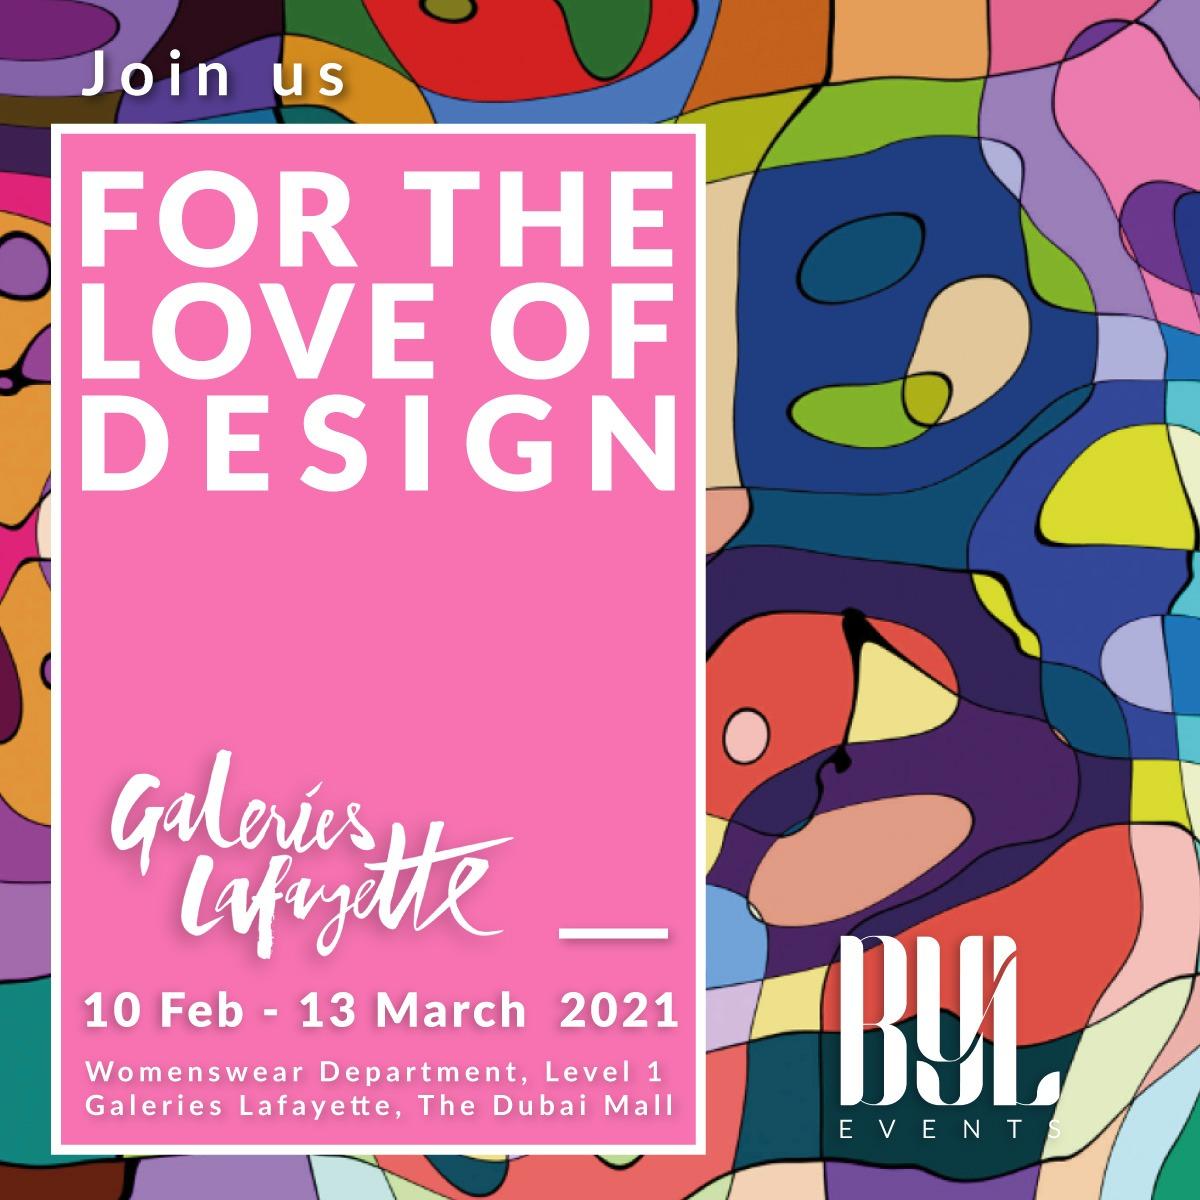 """For The Love of Design"" منصة ترويجية للمصممين الناشئين العرب… مستمرة حتى الـ13 من مارس بضيافة """"Galeries La Fayette  دبي!"